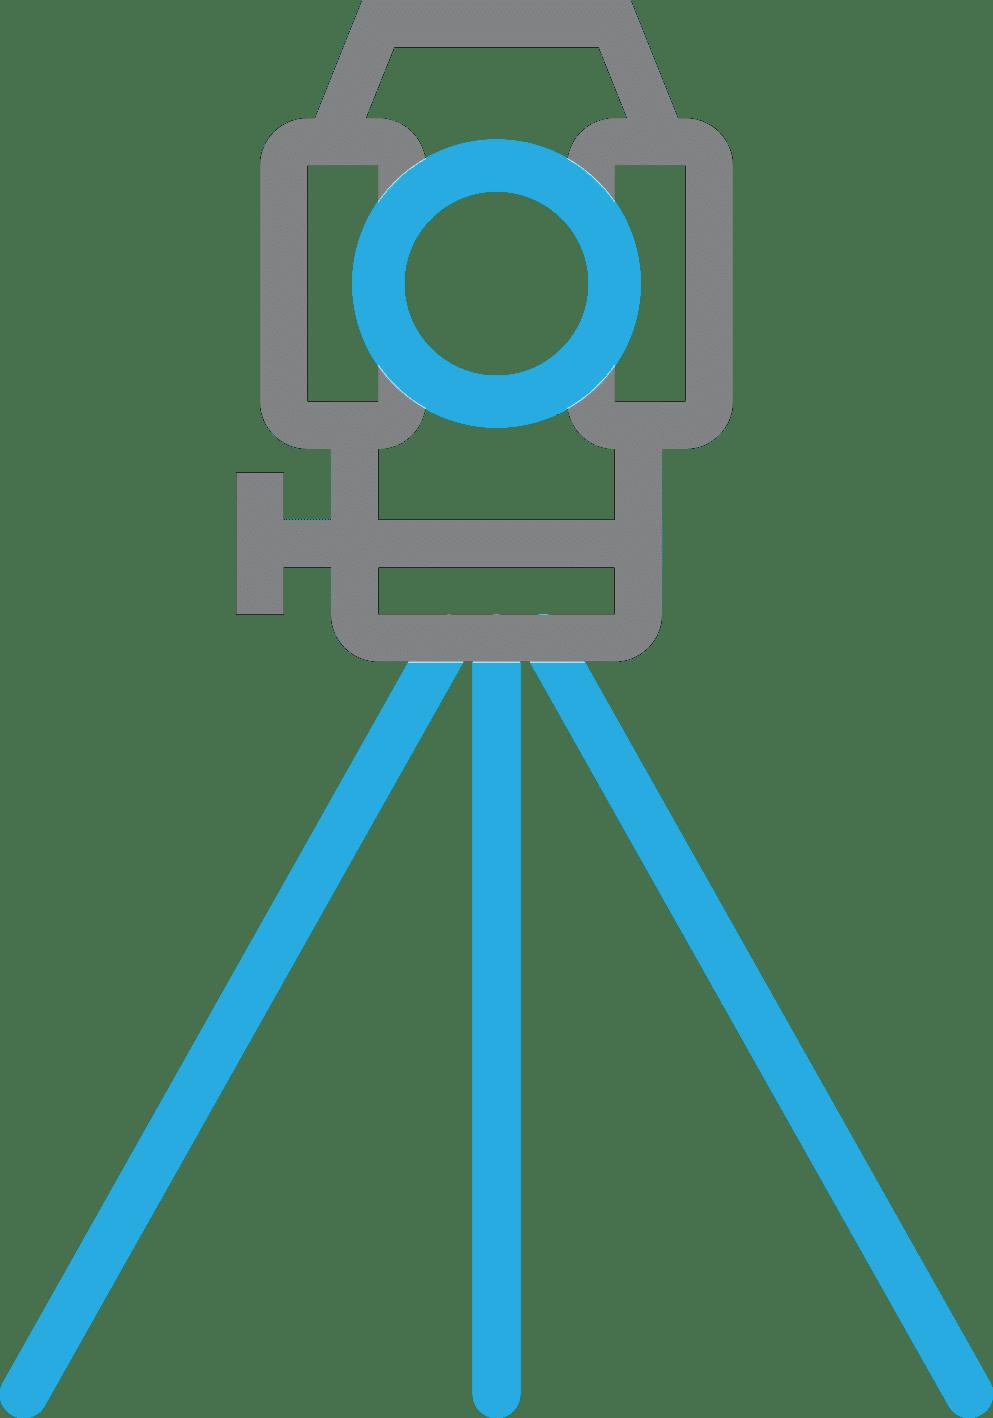 Terrestrial Survey, Dredging, Hydrographic survey,